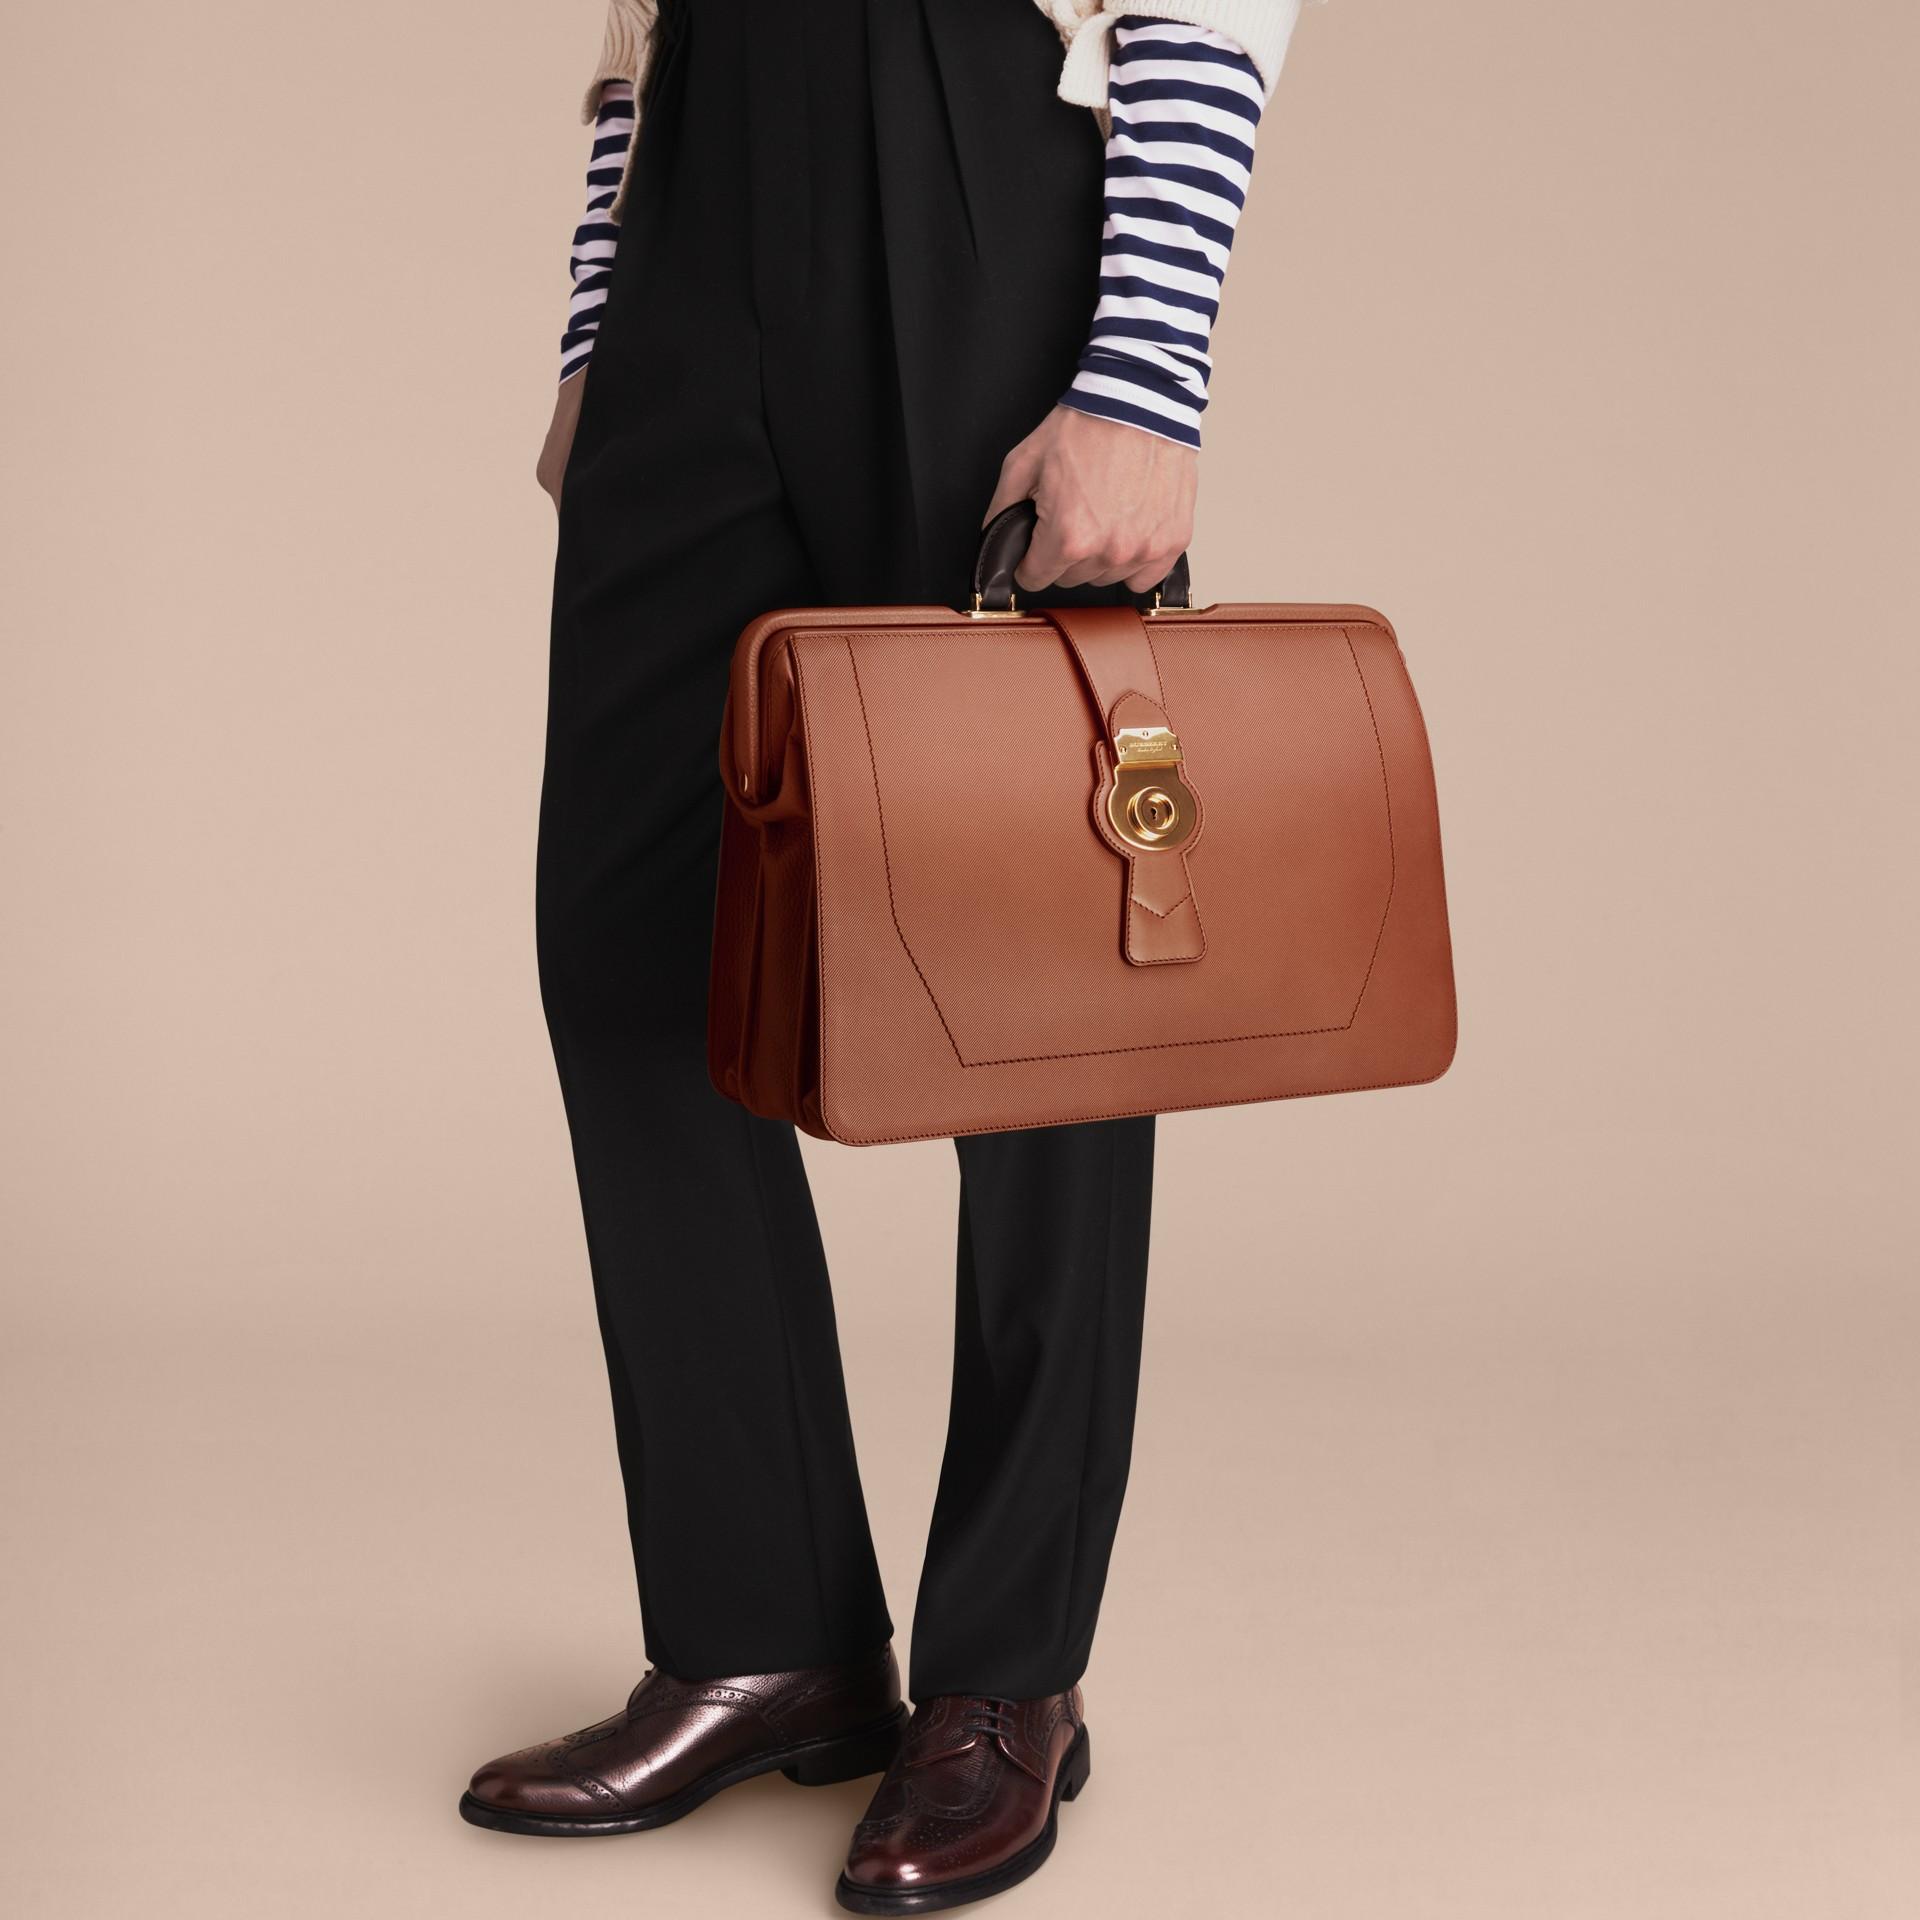 The DK88 Doctor's Bag Tan - gallery image 4